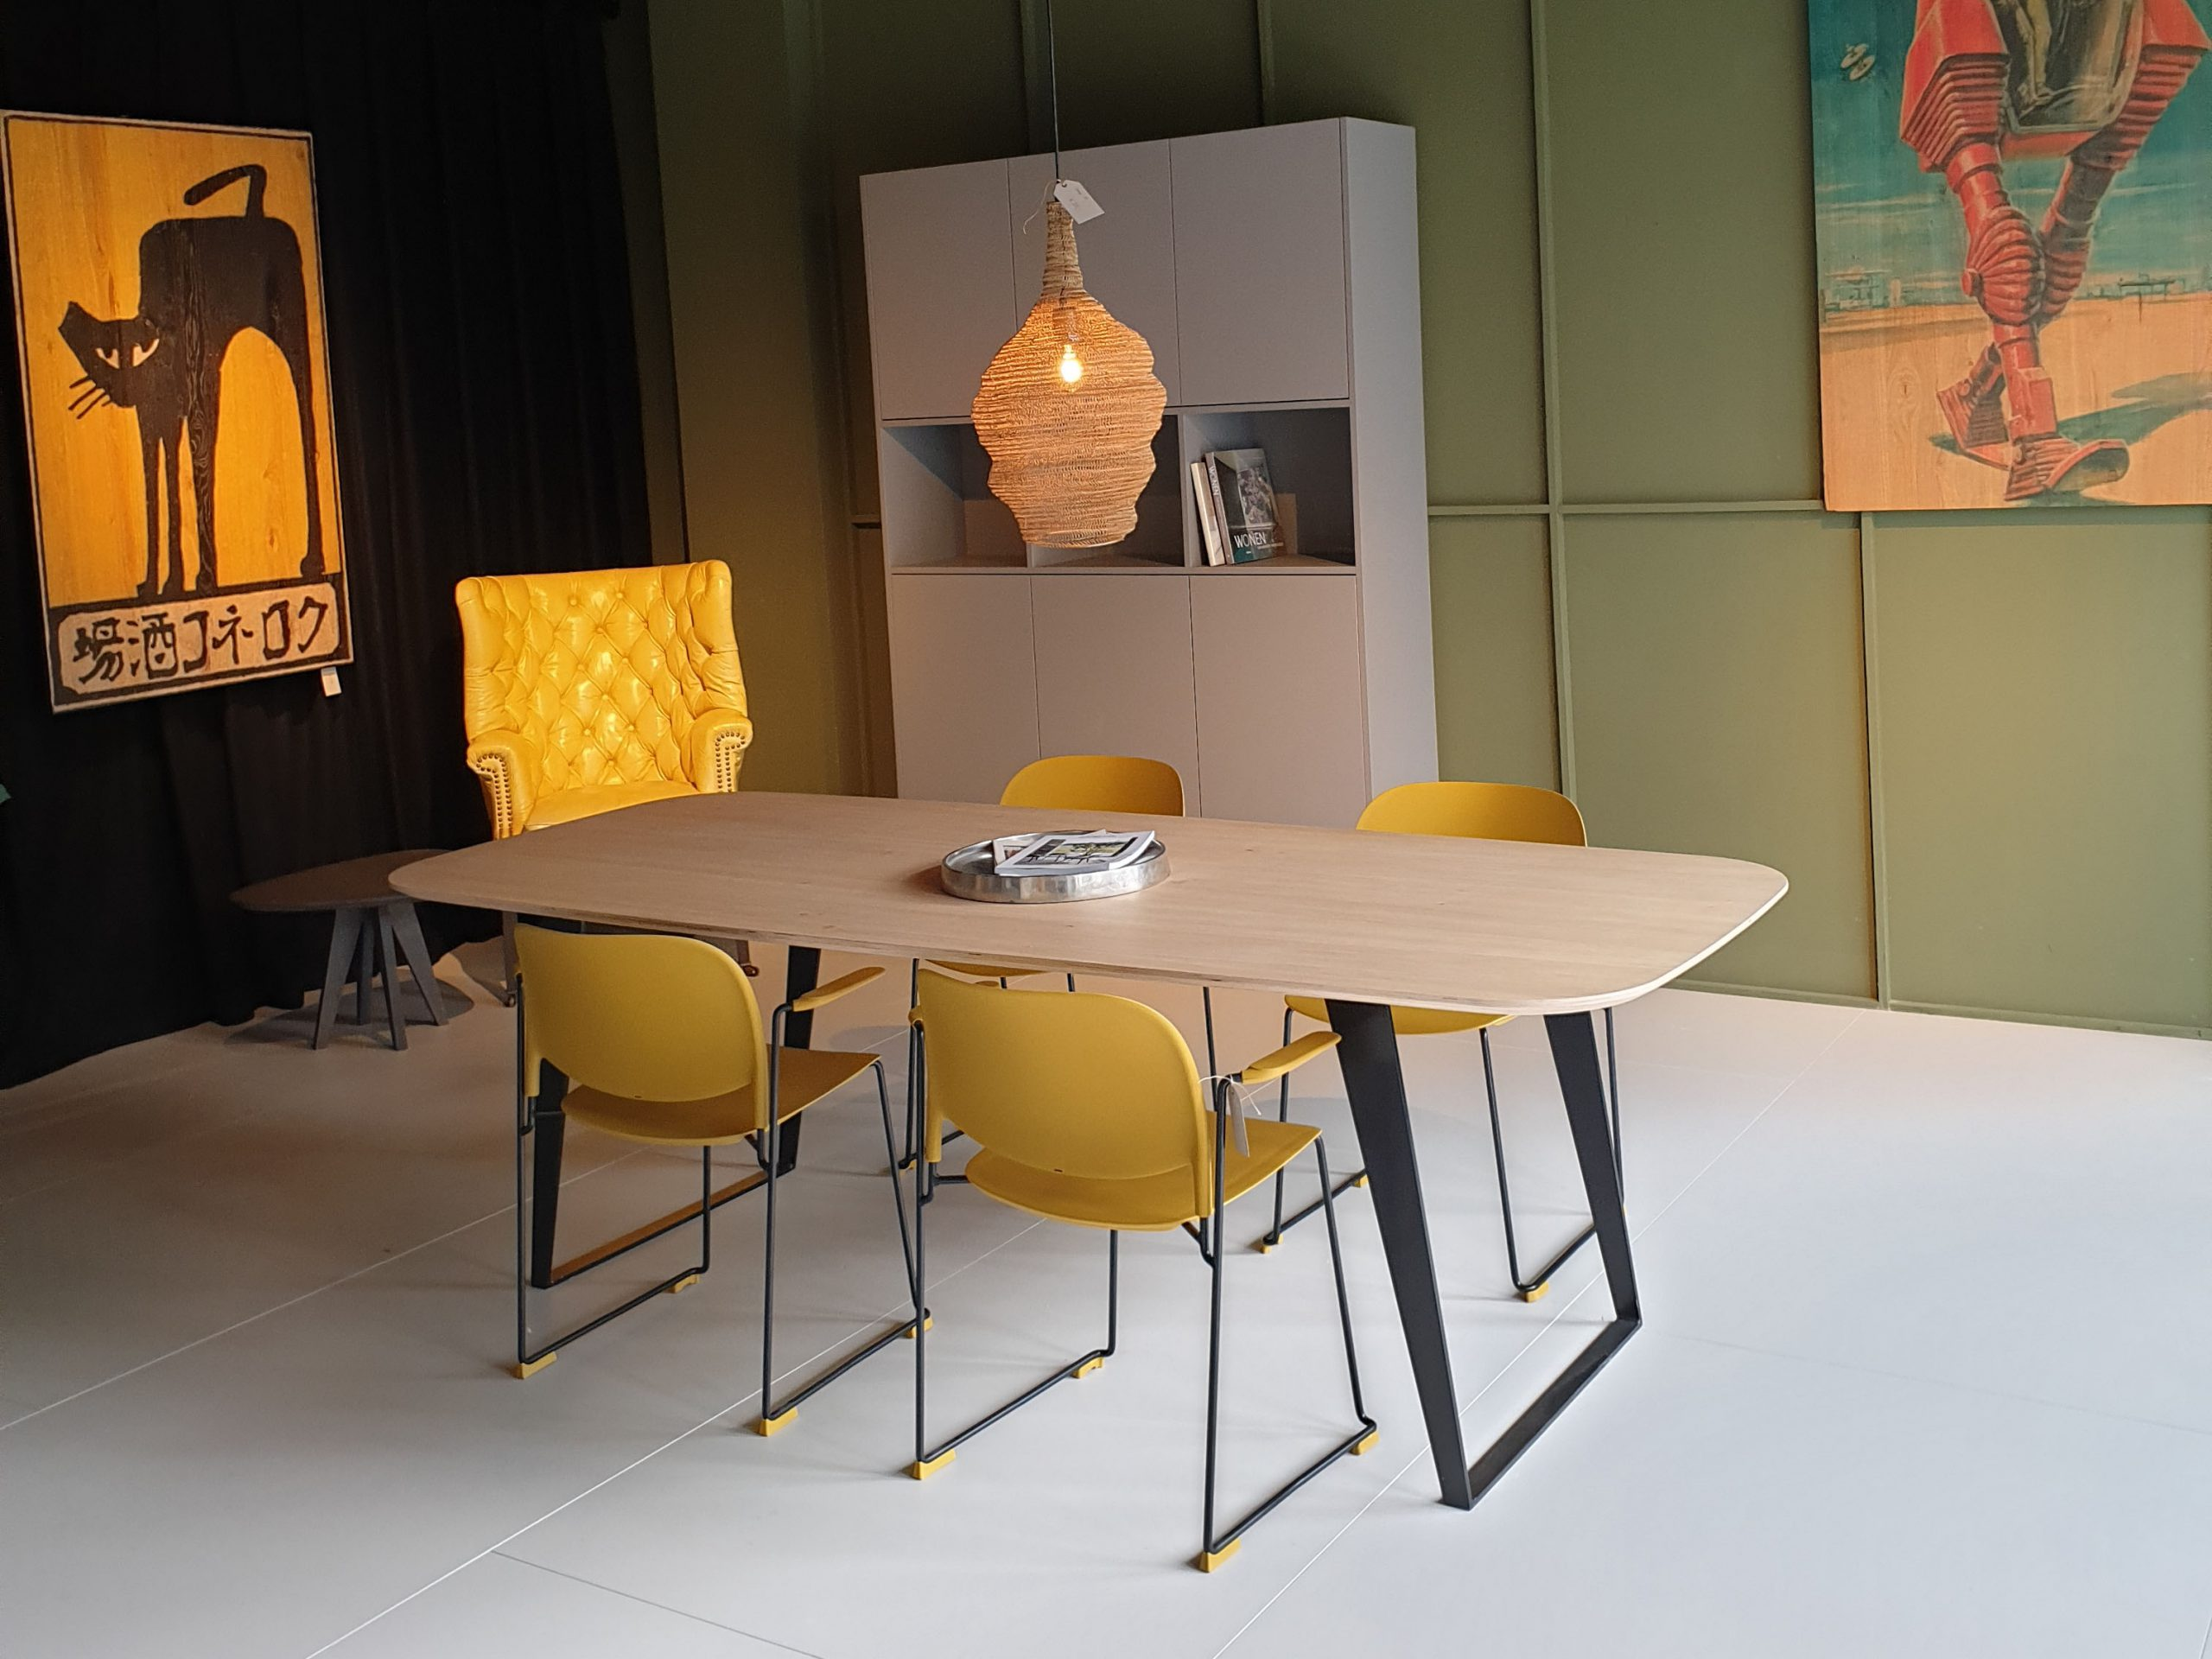 Showroom Gladiolenpad 1 in Uitgeest